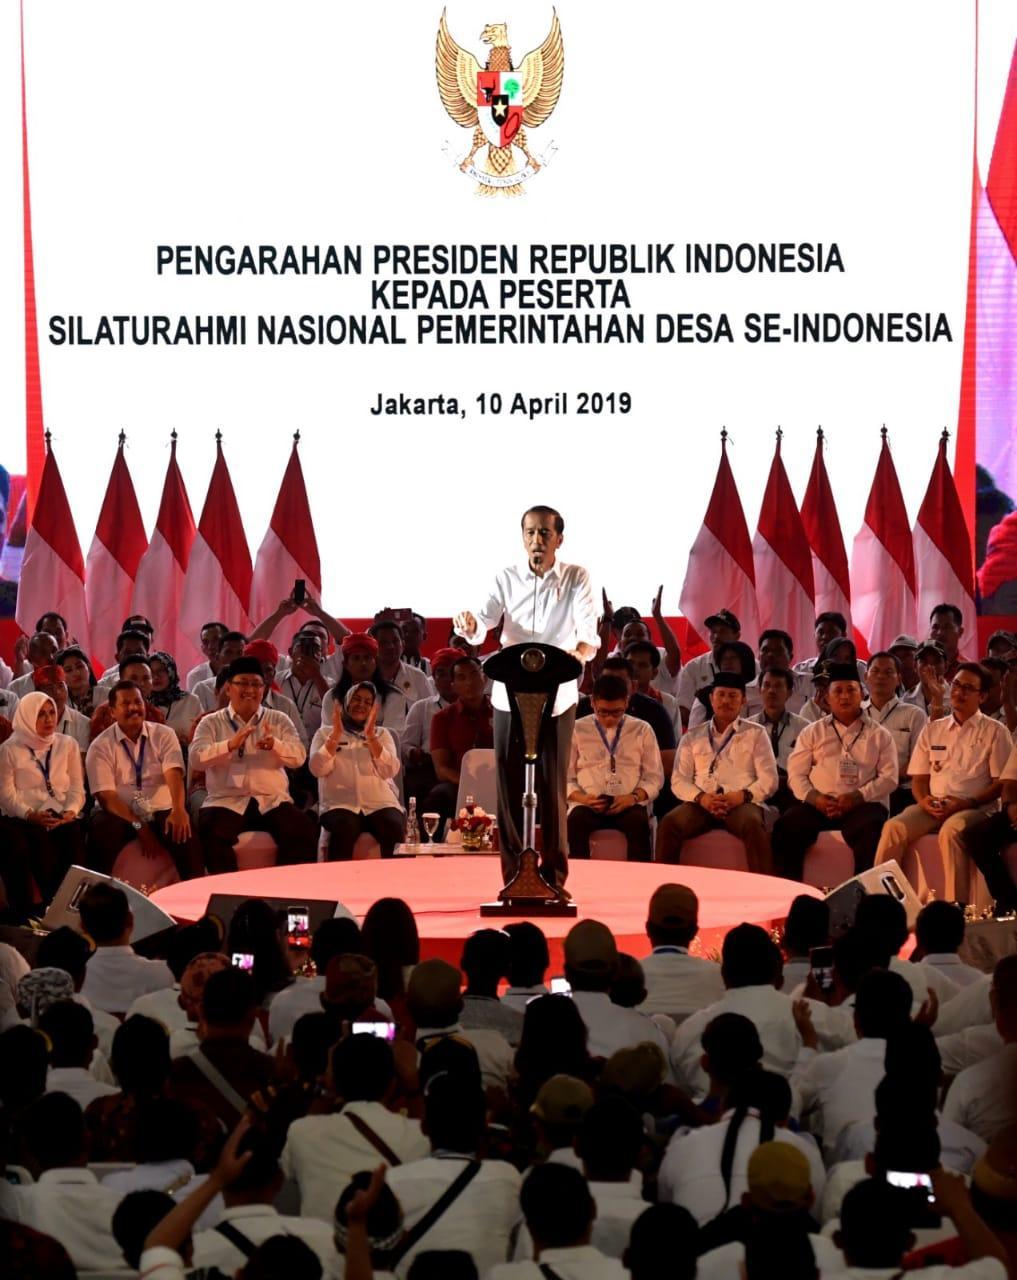 Gulirkan Dana Desa, Presiden Jokowi: Membangun Desa Berarti Membangun Negara